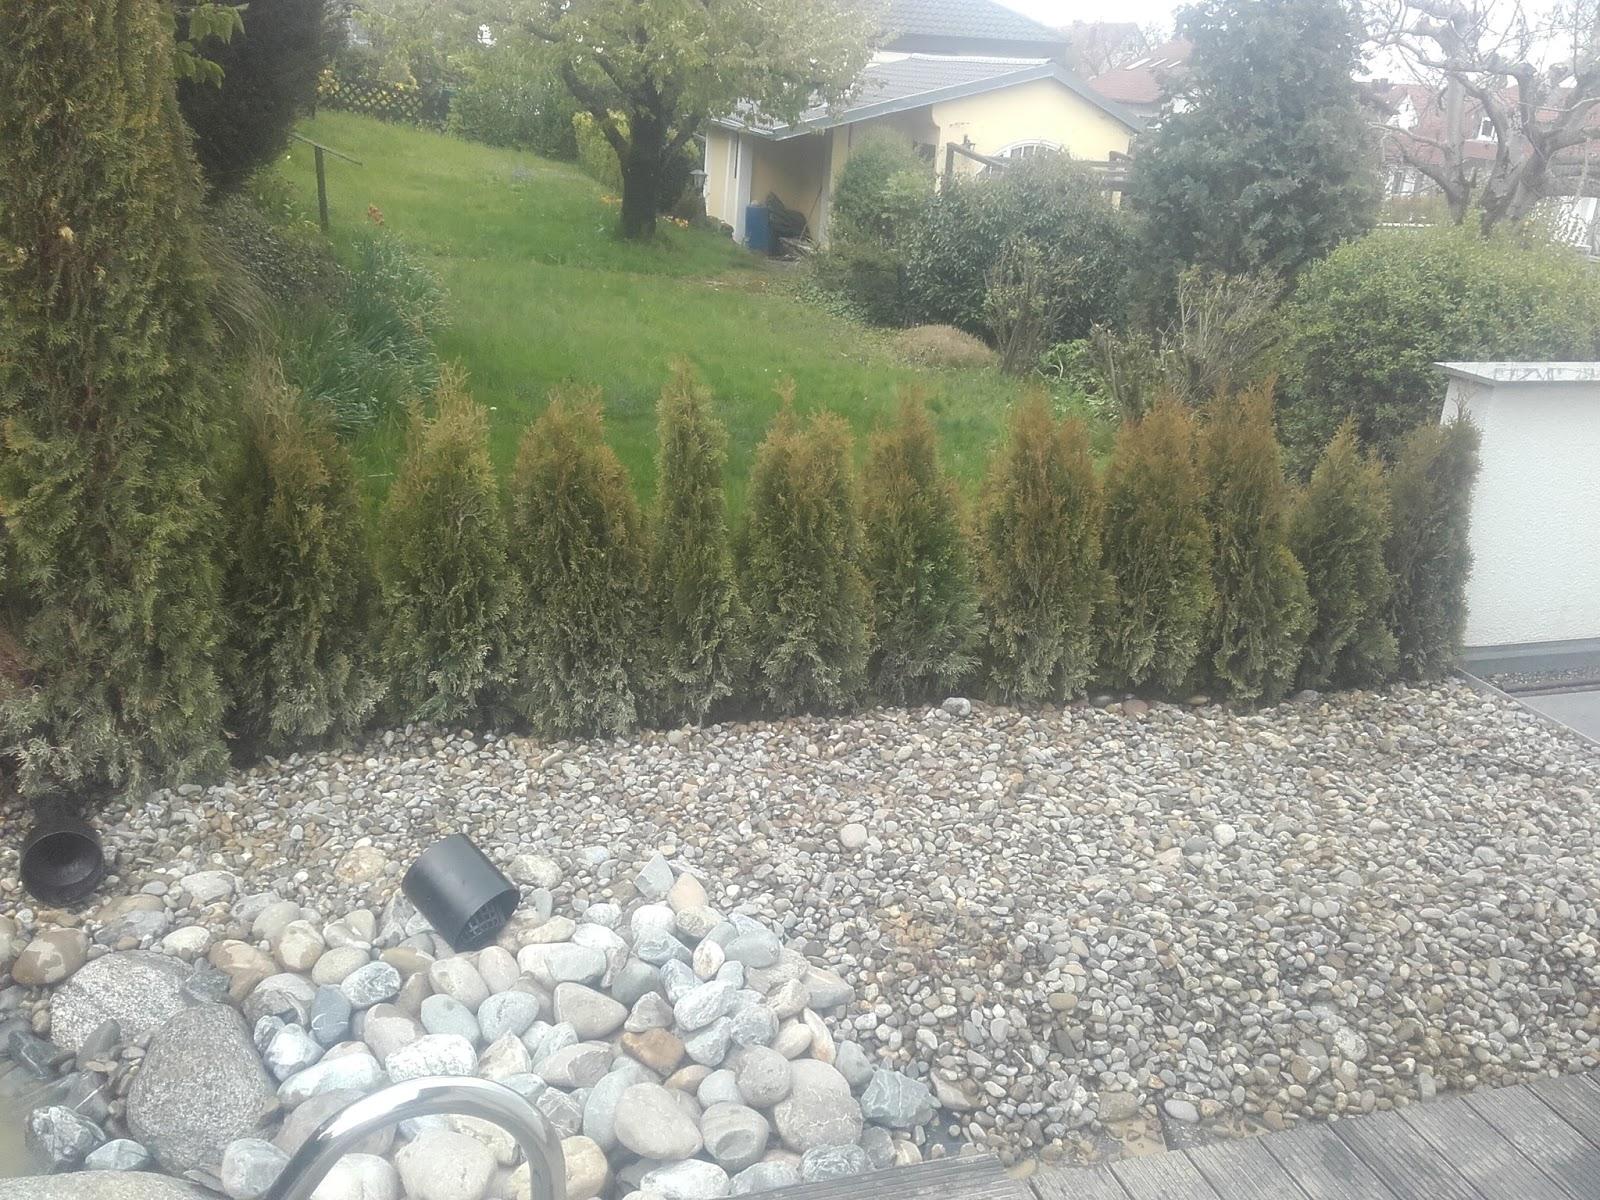 Inspirierend Garten Kies Design